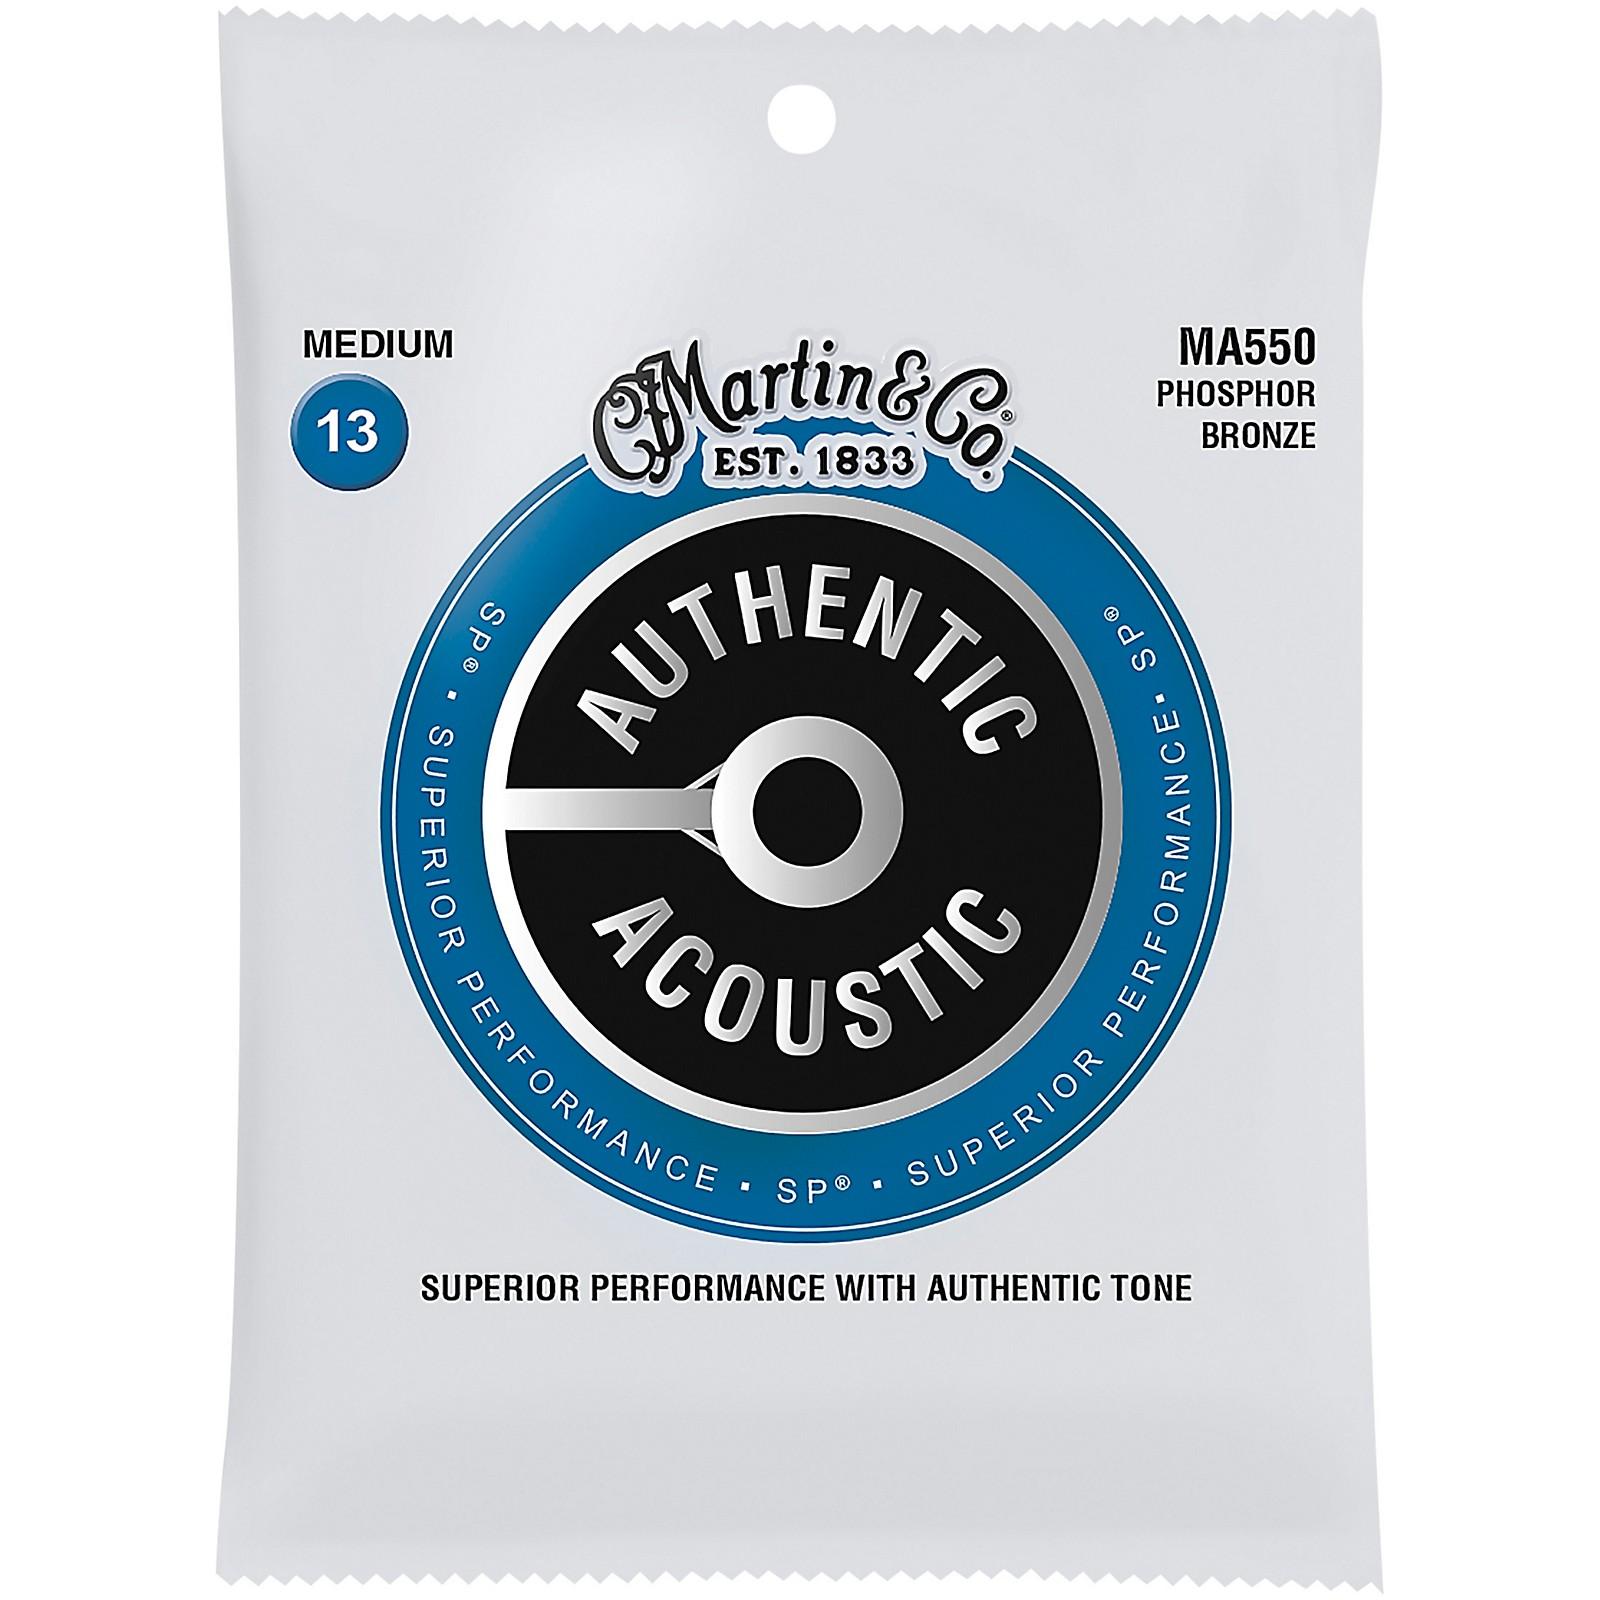 Martin MA550 SP Phosphor Bronze Medium Authentic Acoustic Guitar Strings